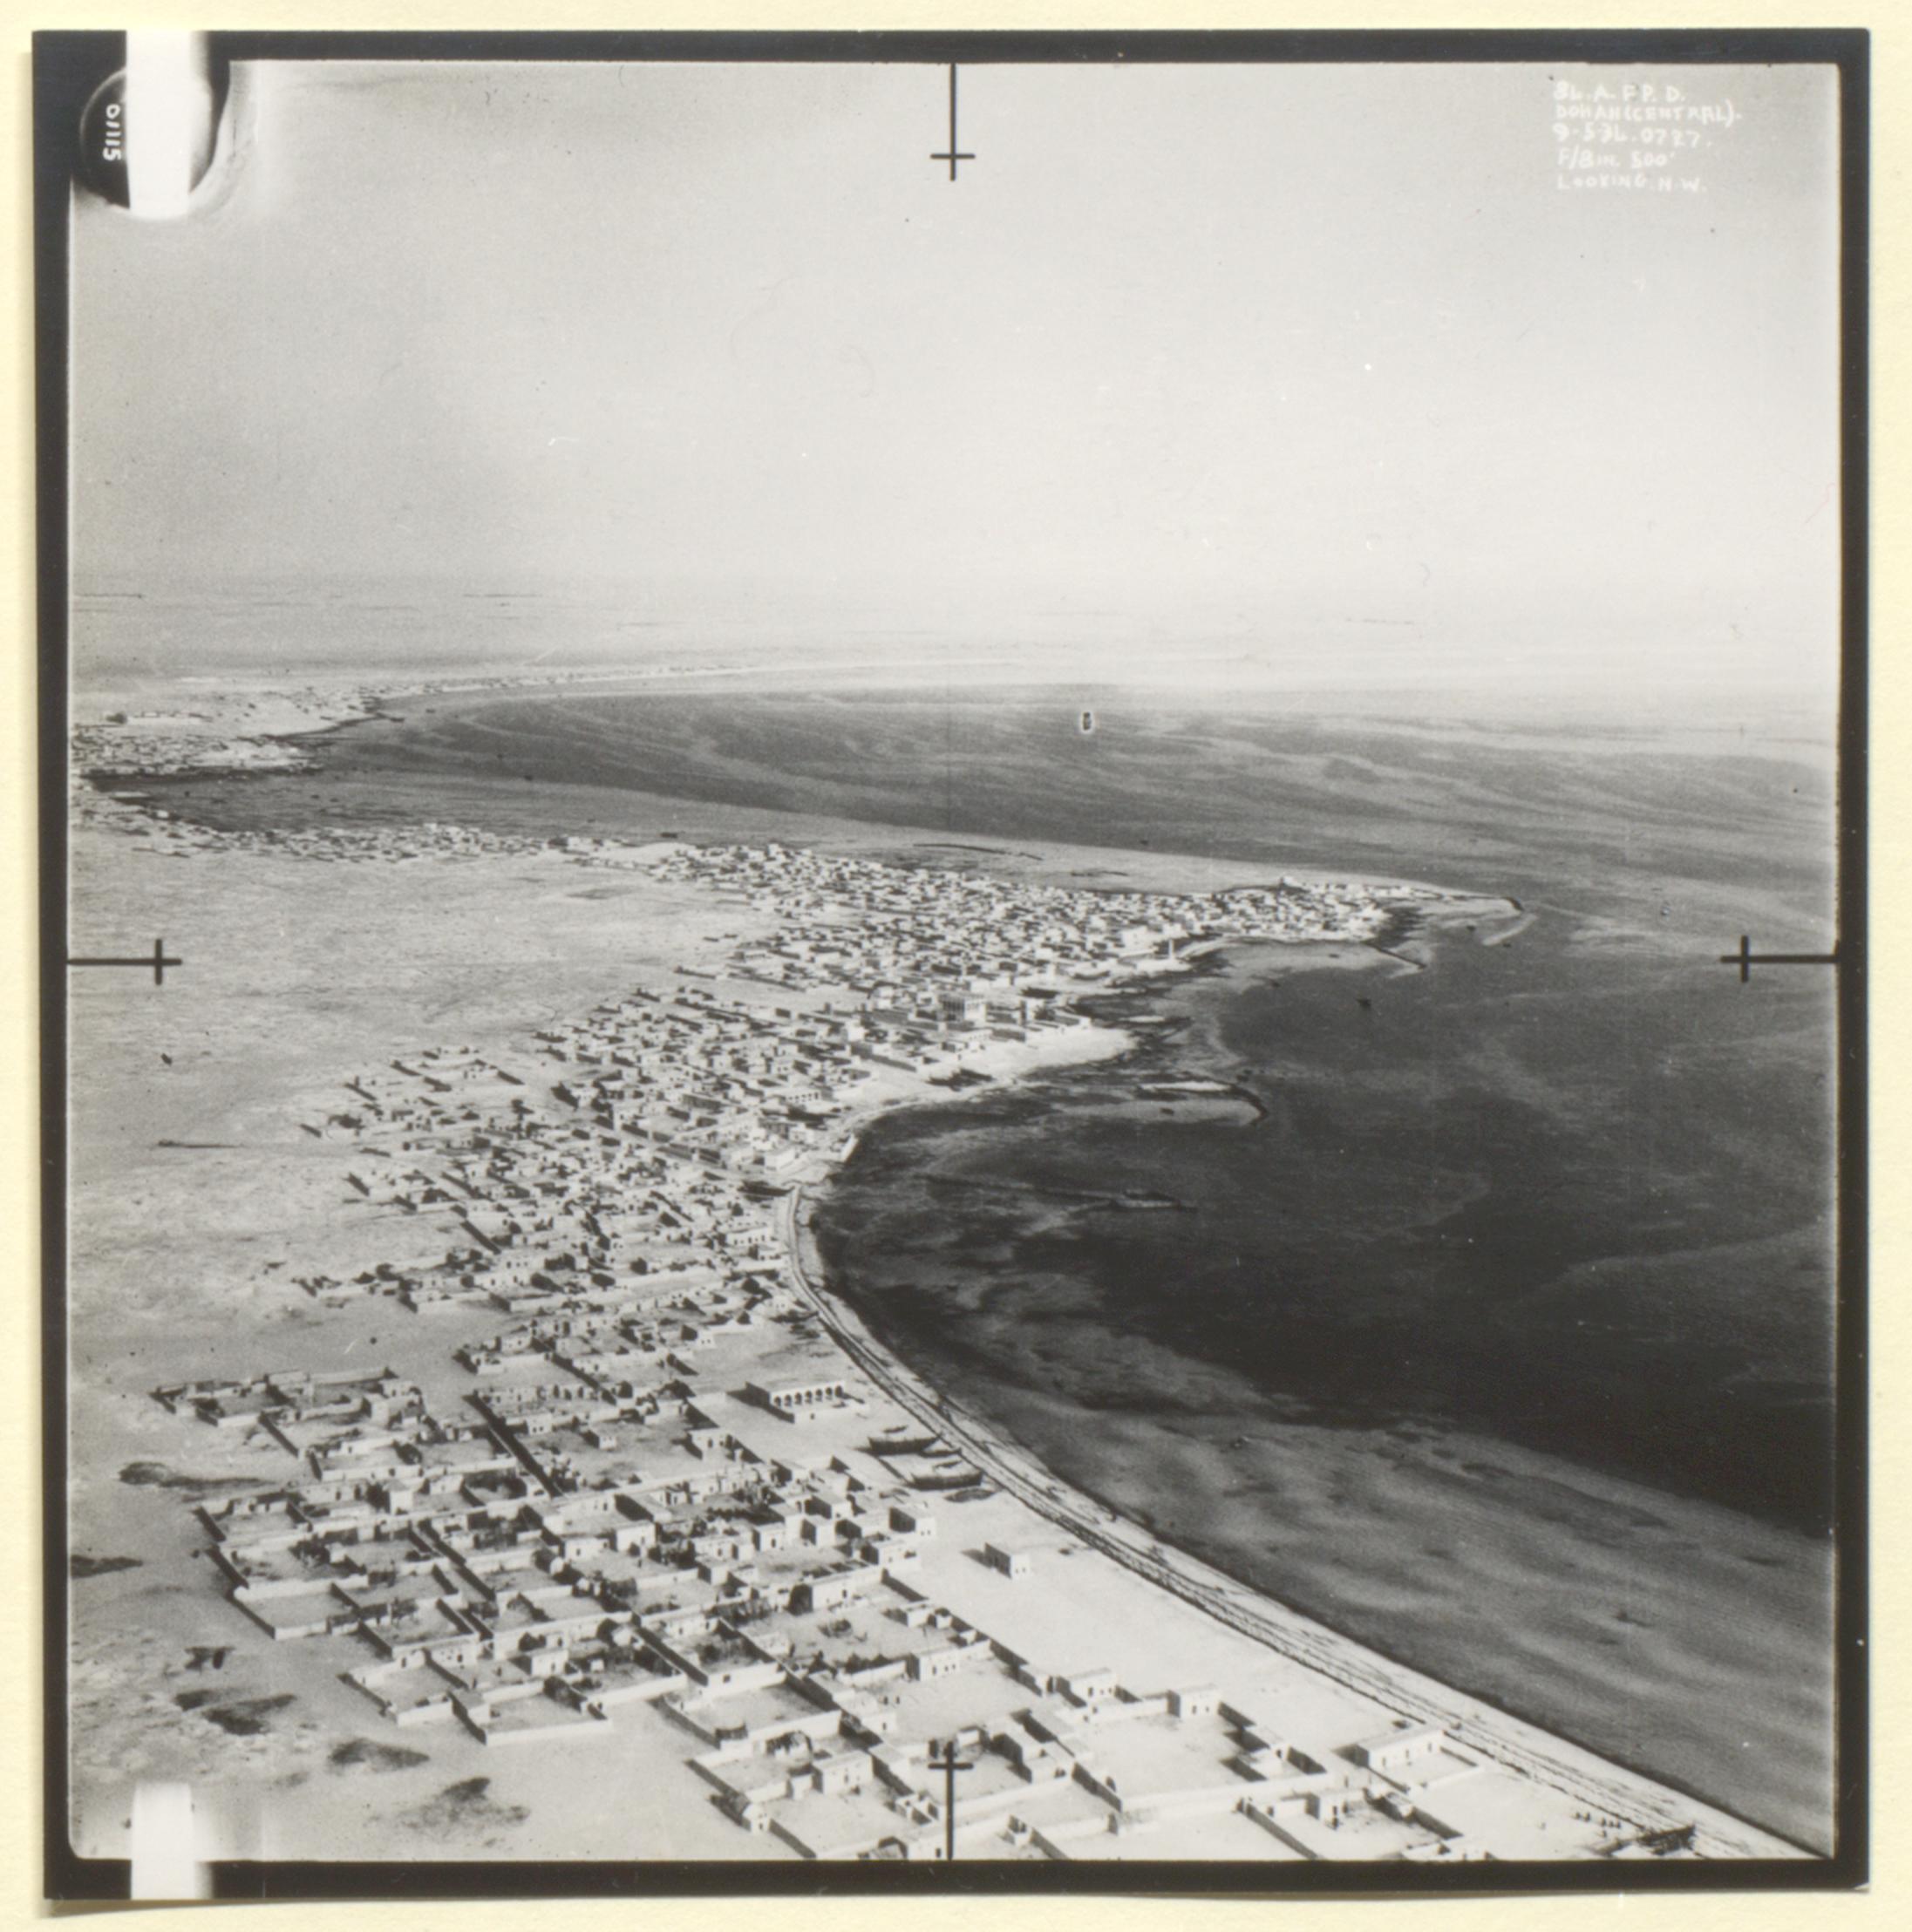 3rd Royal Air Force photograph of Doha, Kara-Ana and Raiyan from a the file 'Air-route to India: Arab coast route; emergency landing ground at Qatar' (1934) (IOR/L/PS/12/1956)